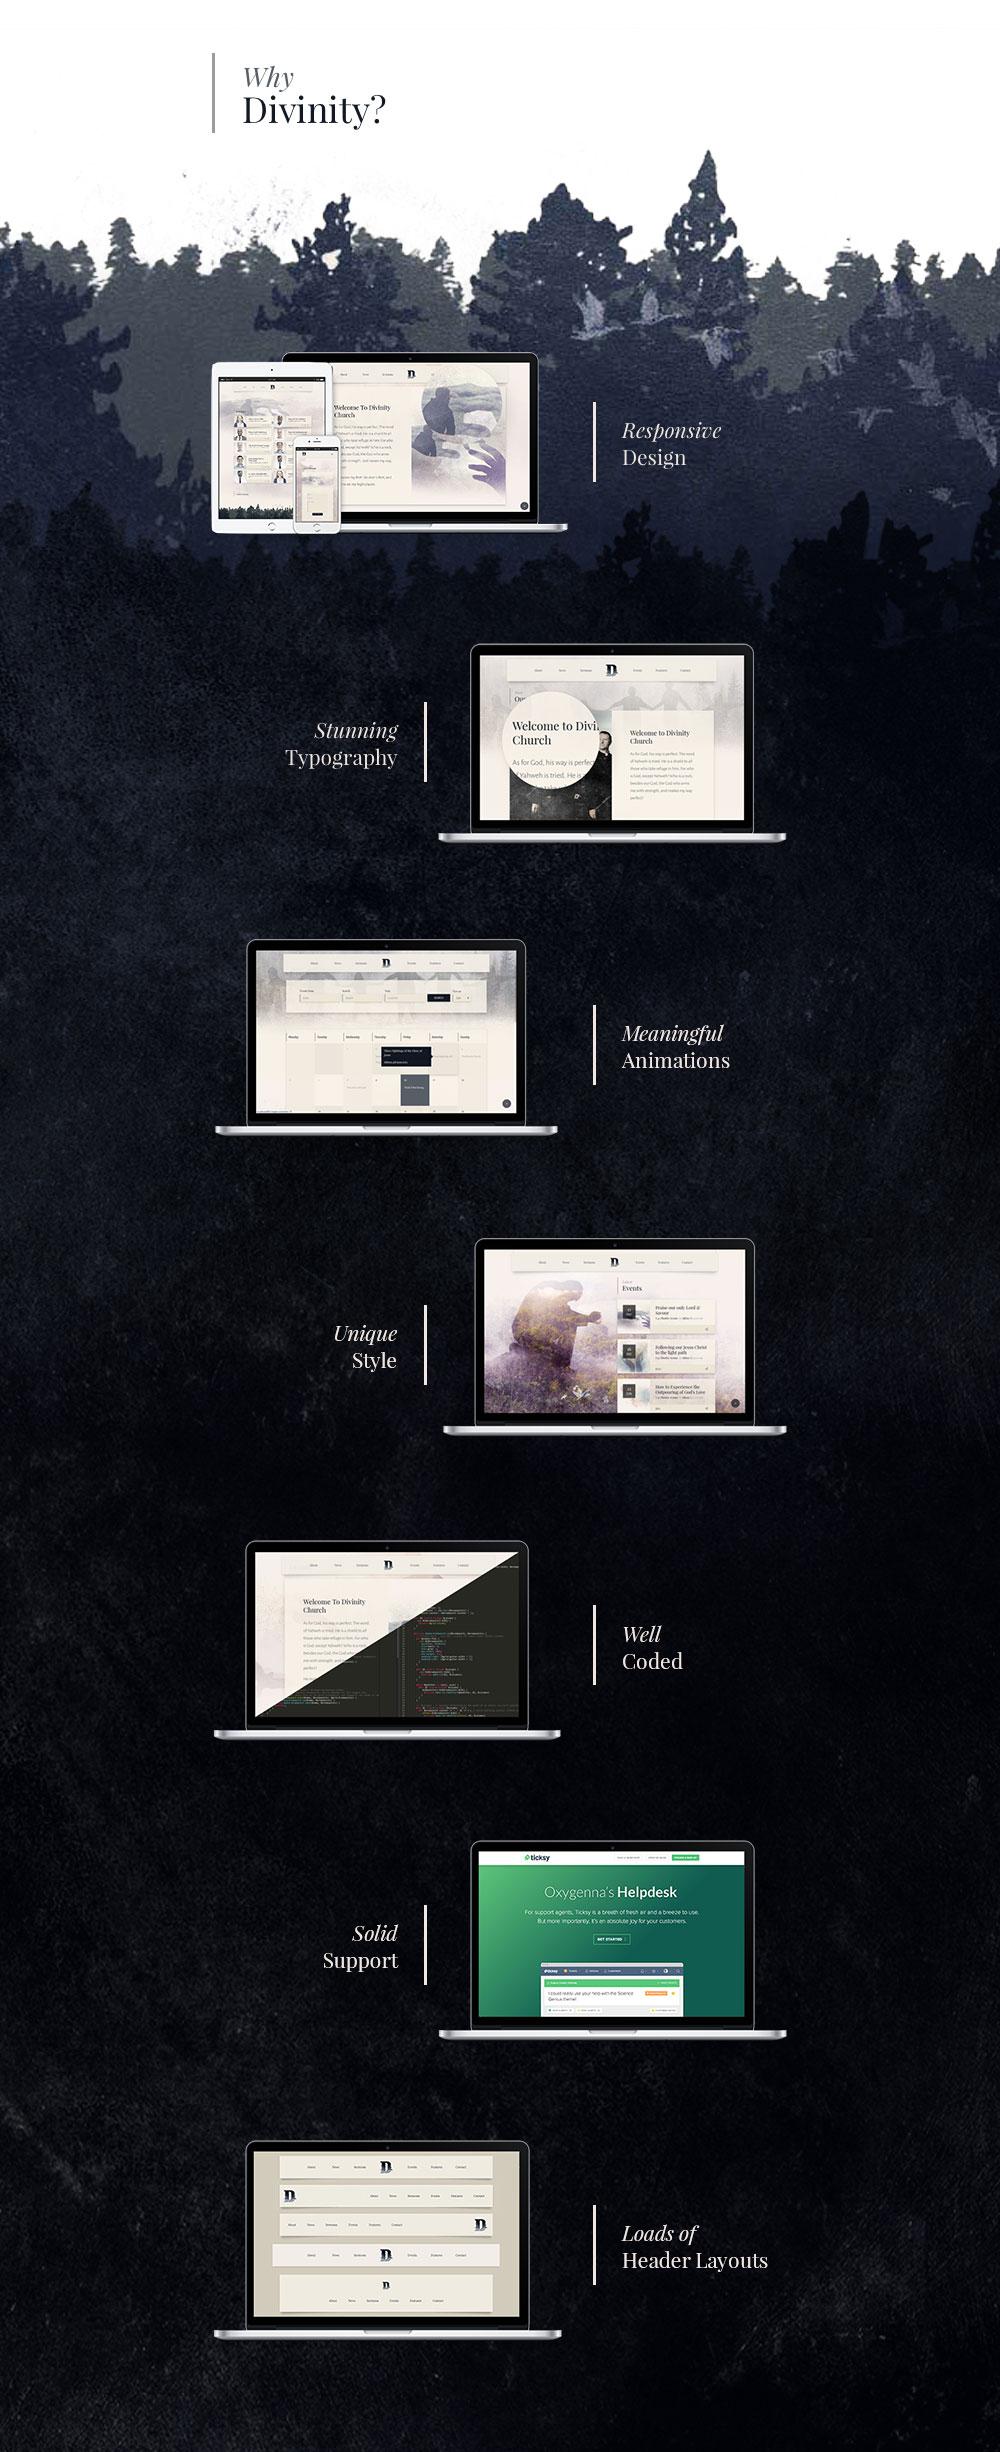 Divinity for WordPress